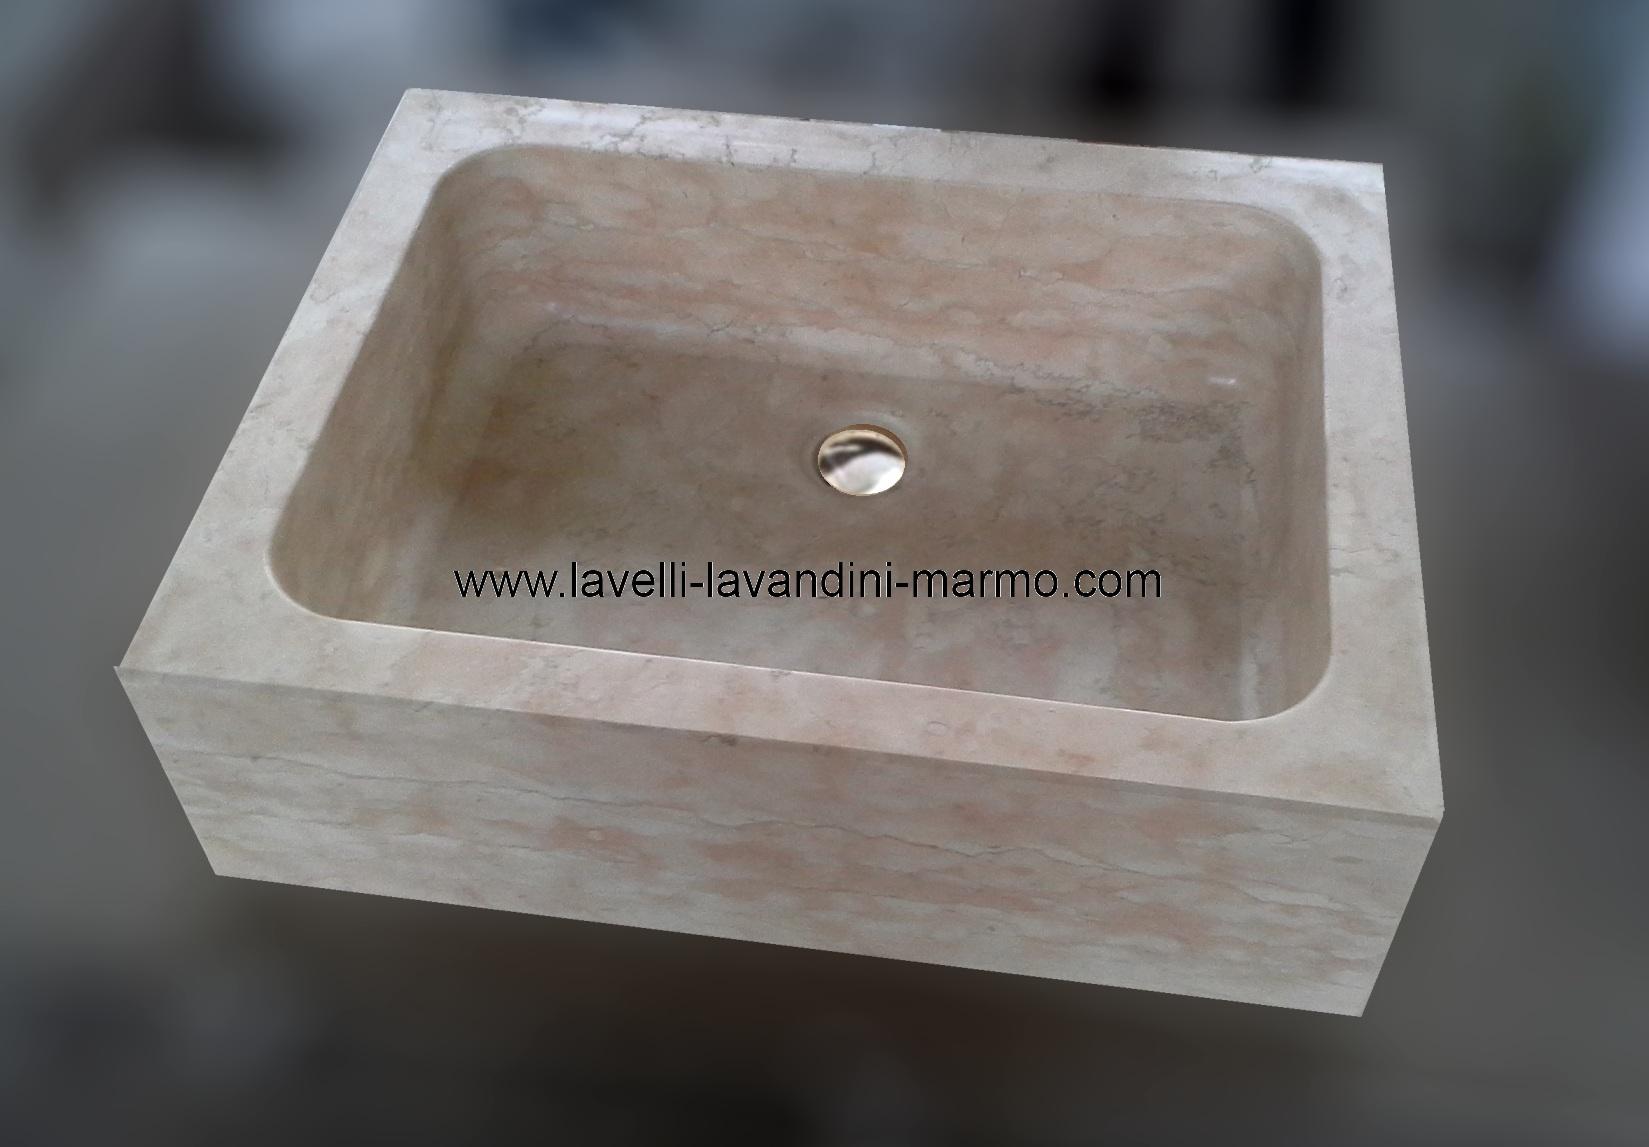 marmo pietra acquaio scavato, cucina esterno taverna ART.LAV4A